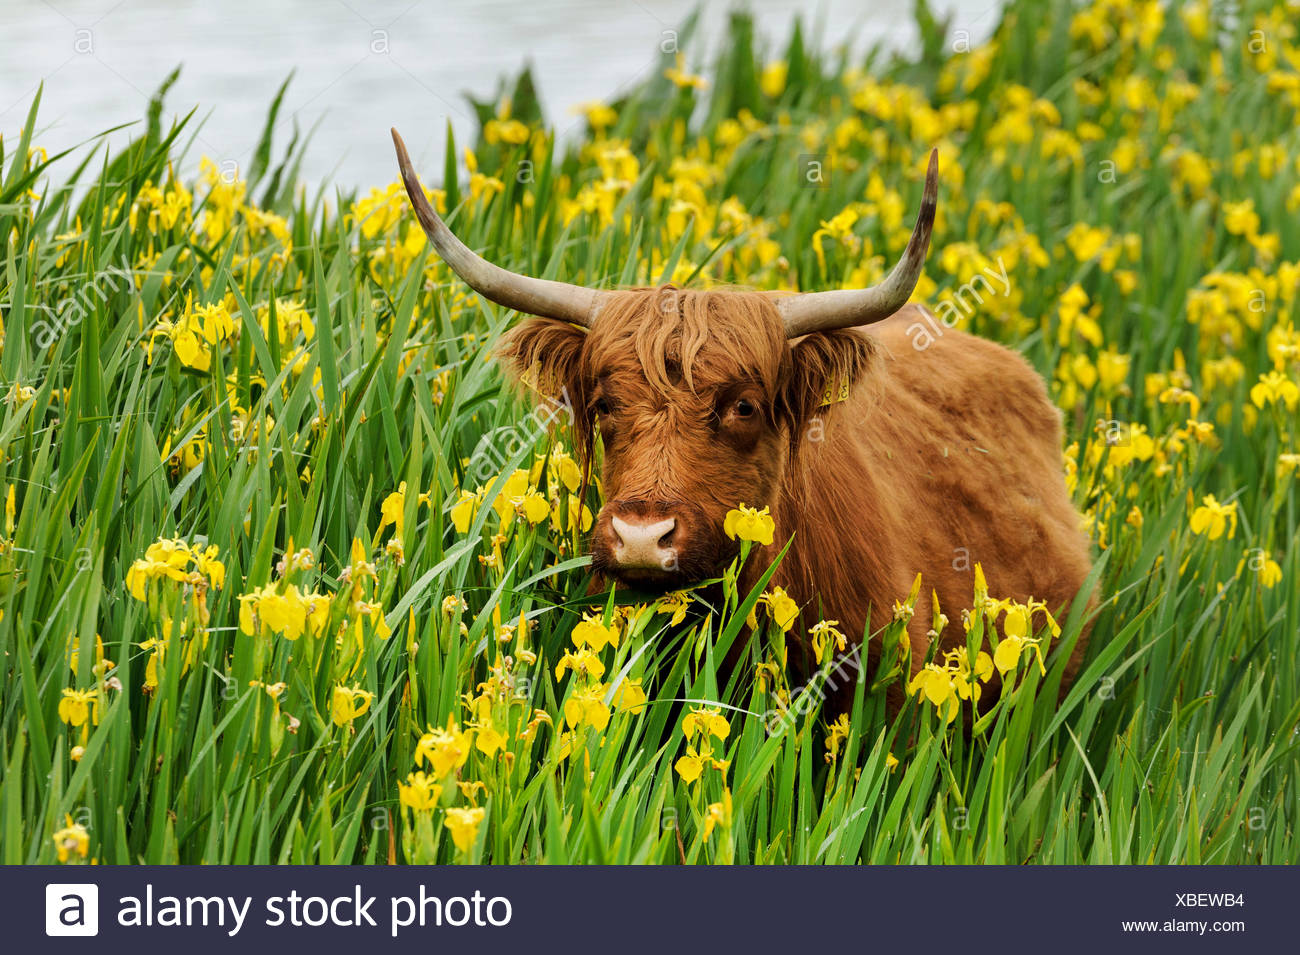 Scottish Highland Cattle, Kyloe (Bos primigenius f. taurus), in a population of yellow iris (Iris pseudacorus), Germany - Stock Image